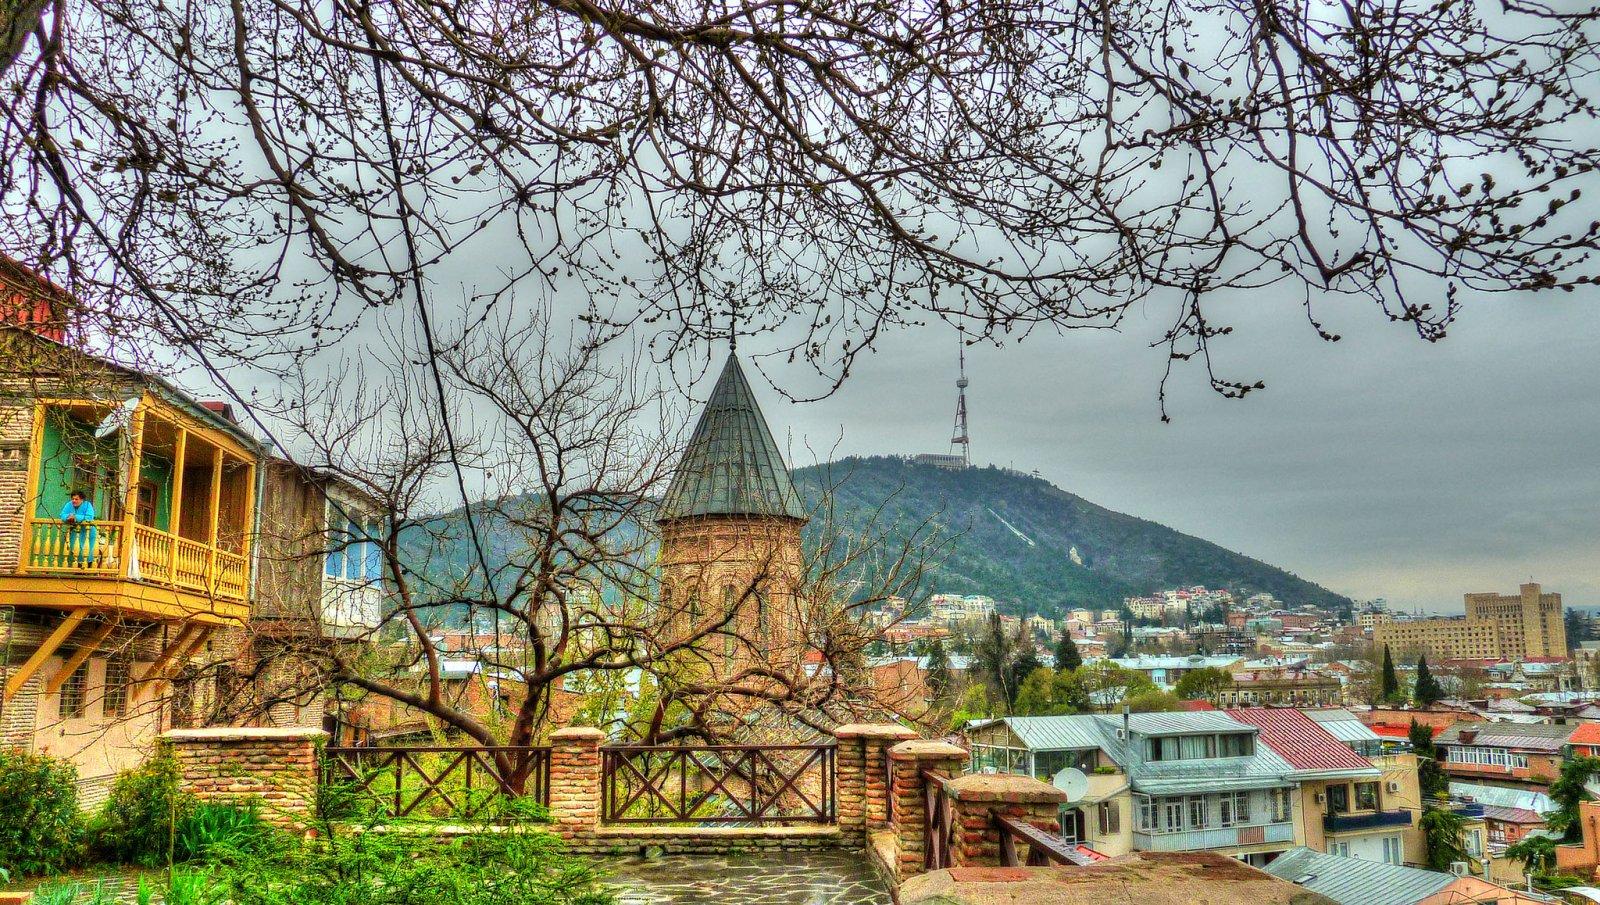 Тур по Грузии. Тбилиси — Мцхета — Кахетия — Сигнахи — Батуми